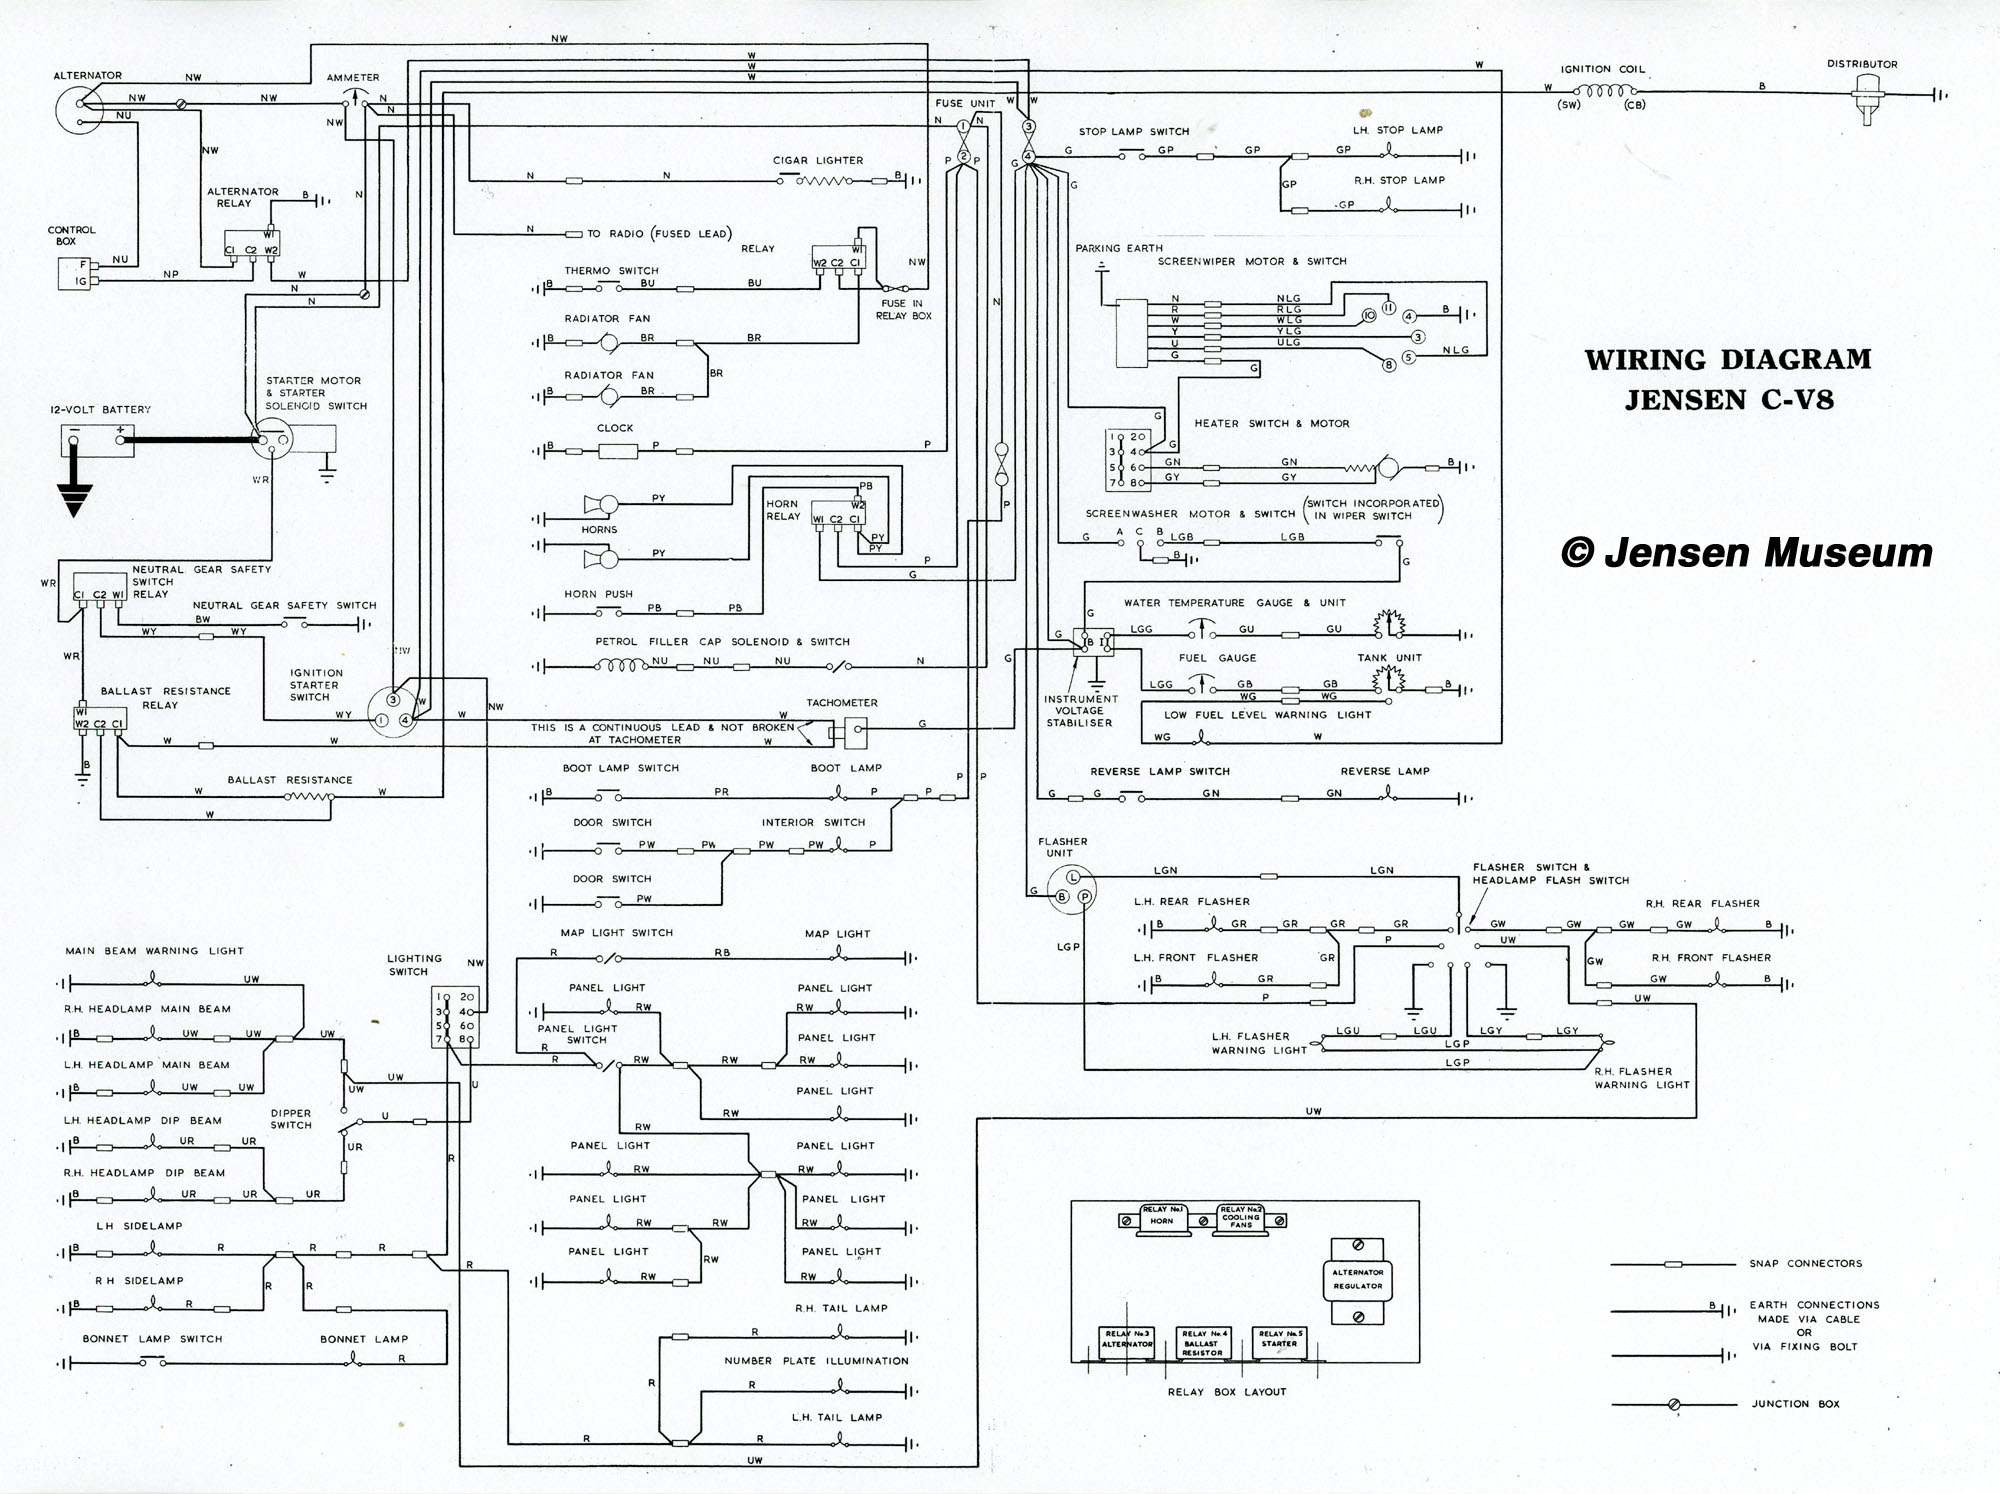 Saturn 300 Engine Wiring Diagrams Get Free Image About Wiring